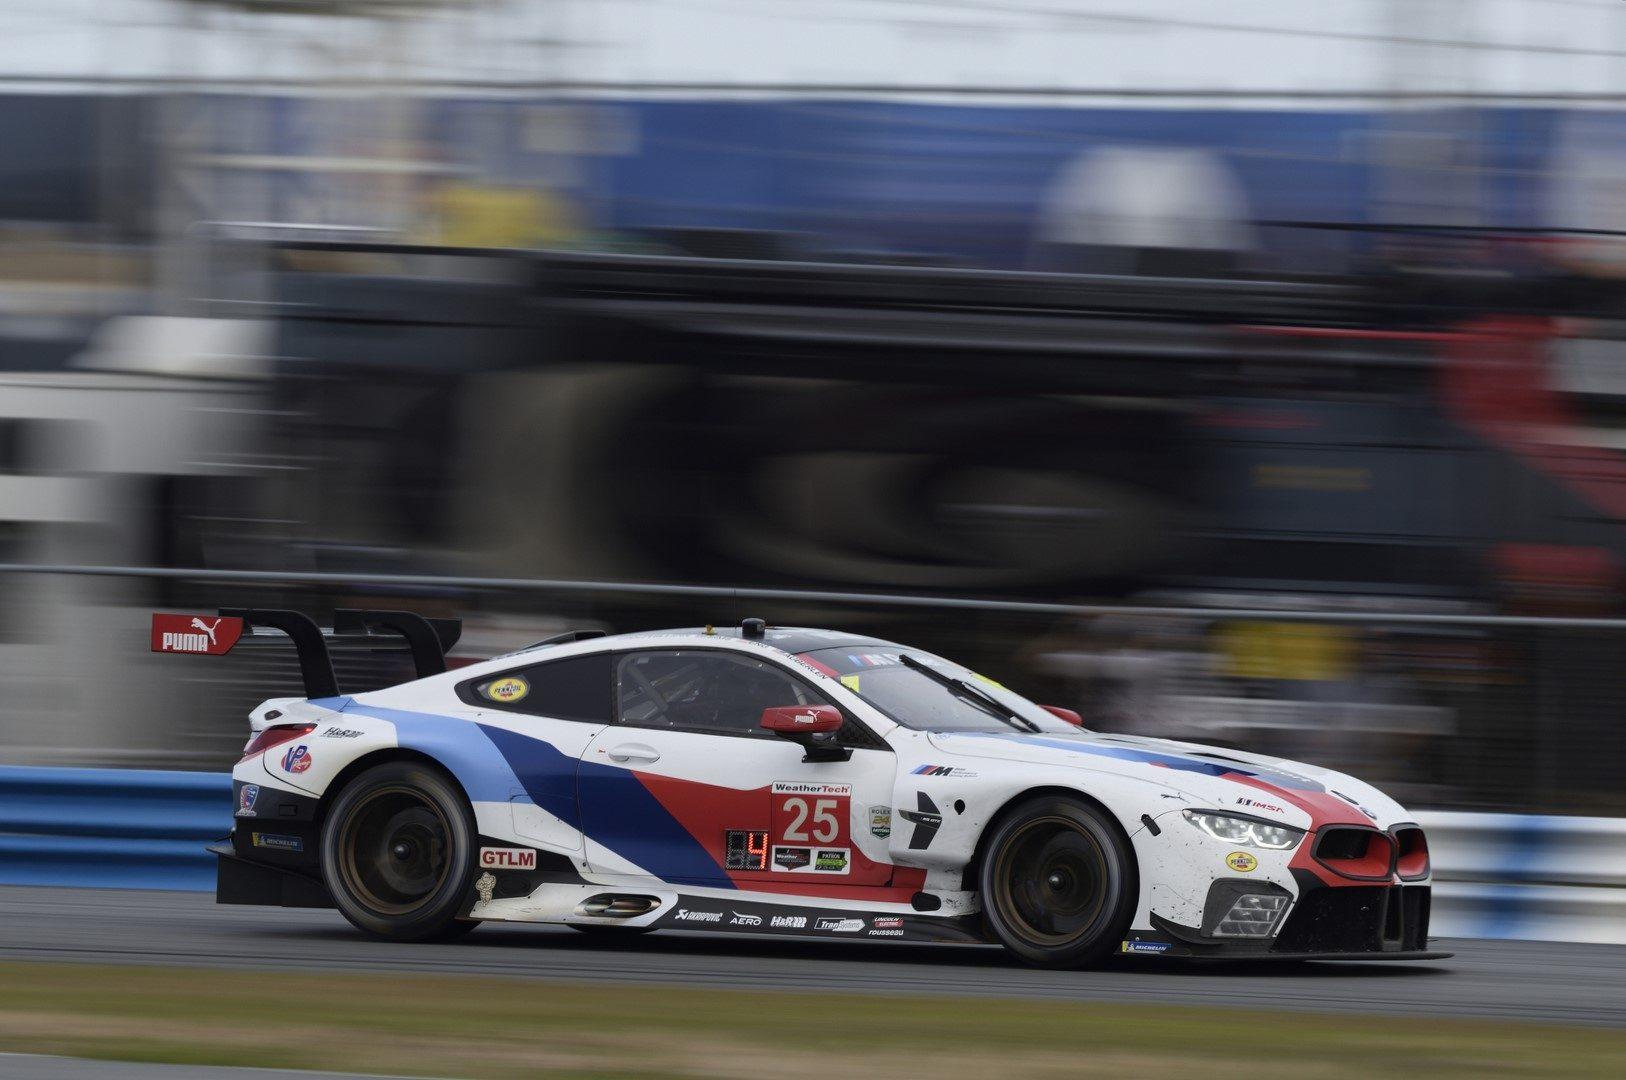 BMW-M8-GTE-Master-race-debut-004-1626x1080